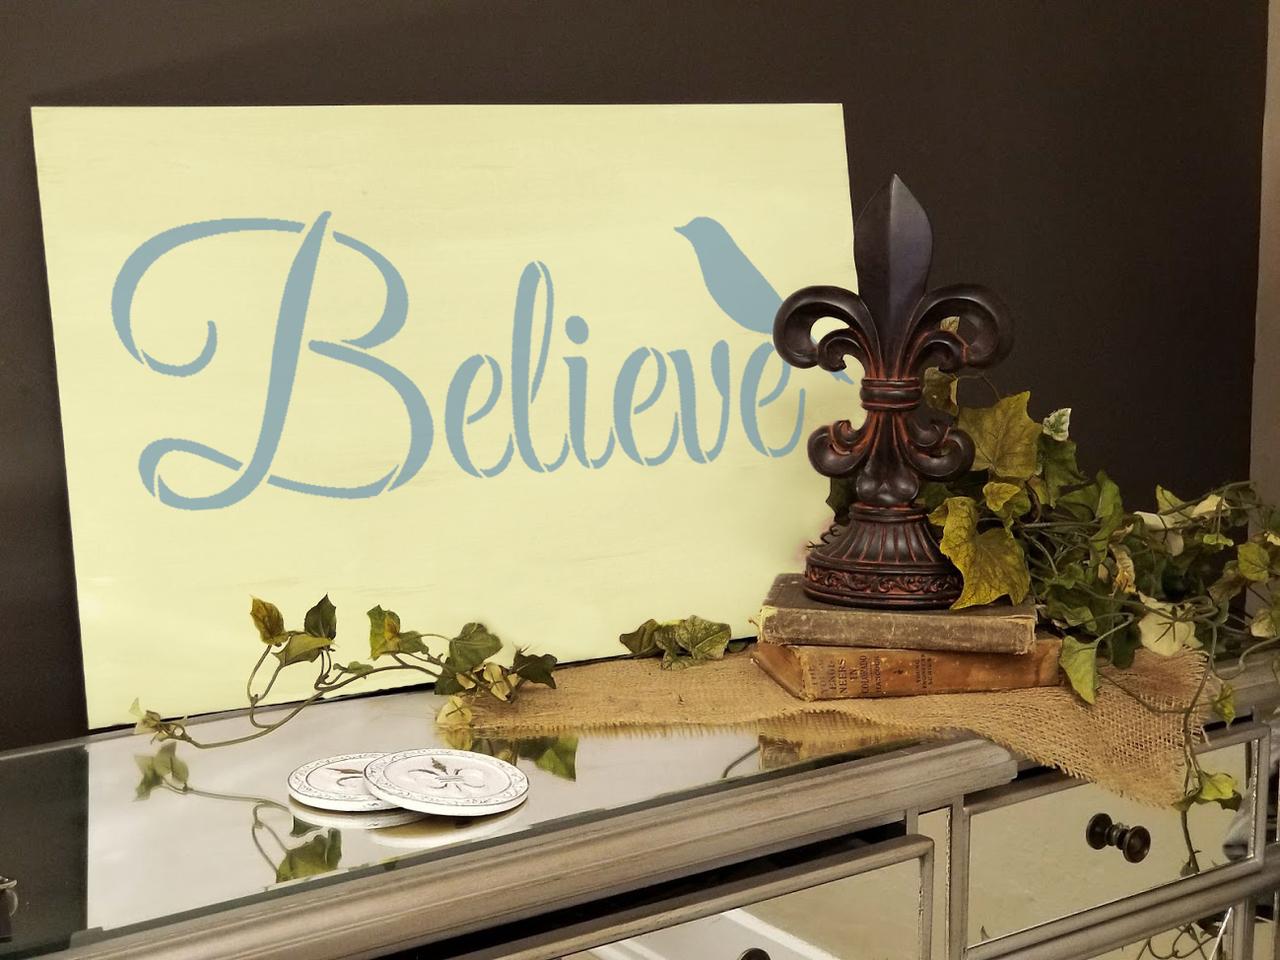 "Believe Word Stencil with Bird by StudioR12 -  Faith & Inspiration Word Art - 24"" x 9"" - STCL2412_4"